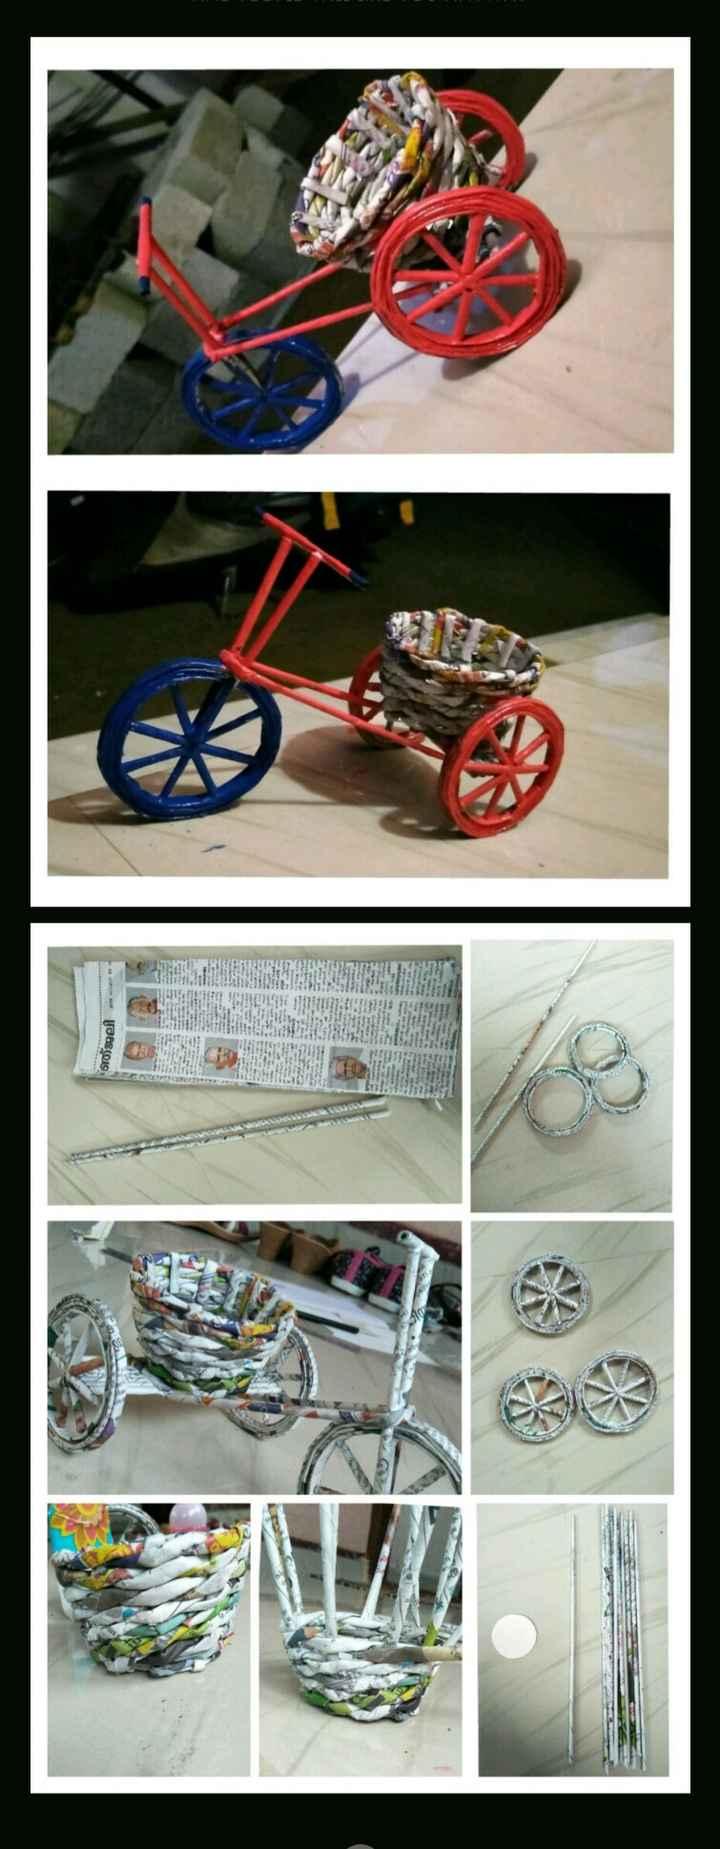 my craft work - ഞ്ജലി 1 1 12 13 14 15 16 1 1 1 ti : 13 : 31 : 111 111 , 111 - ShareChat